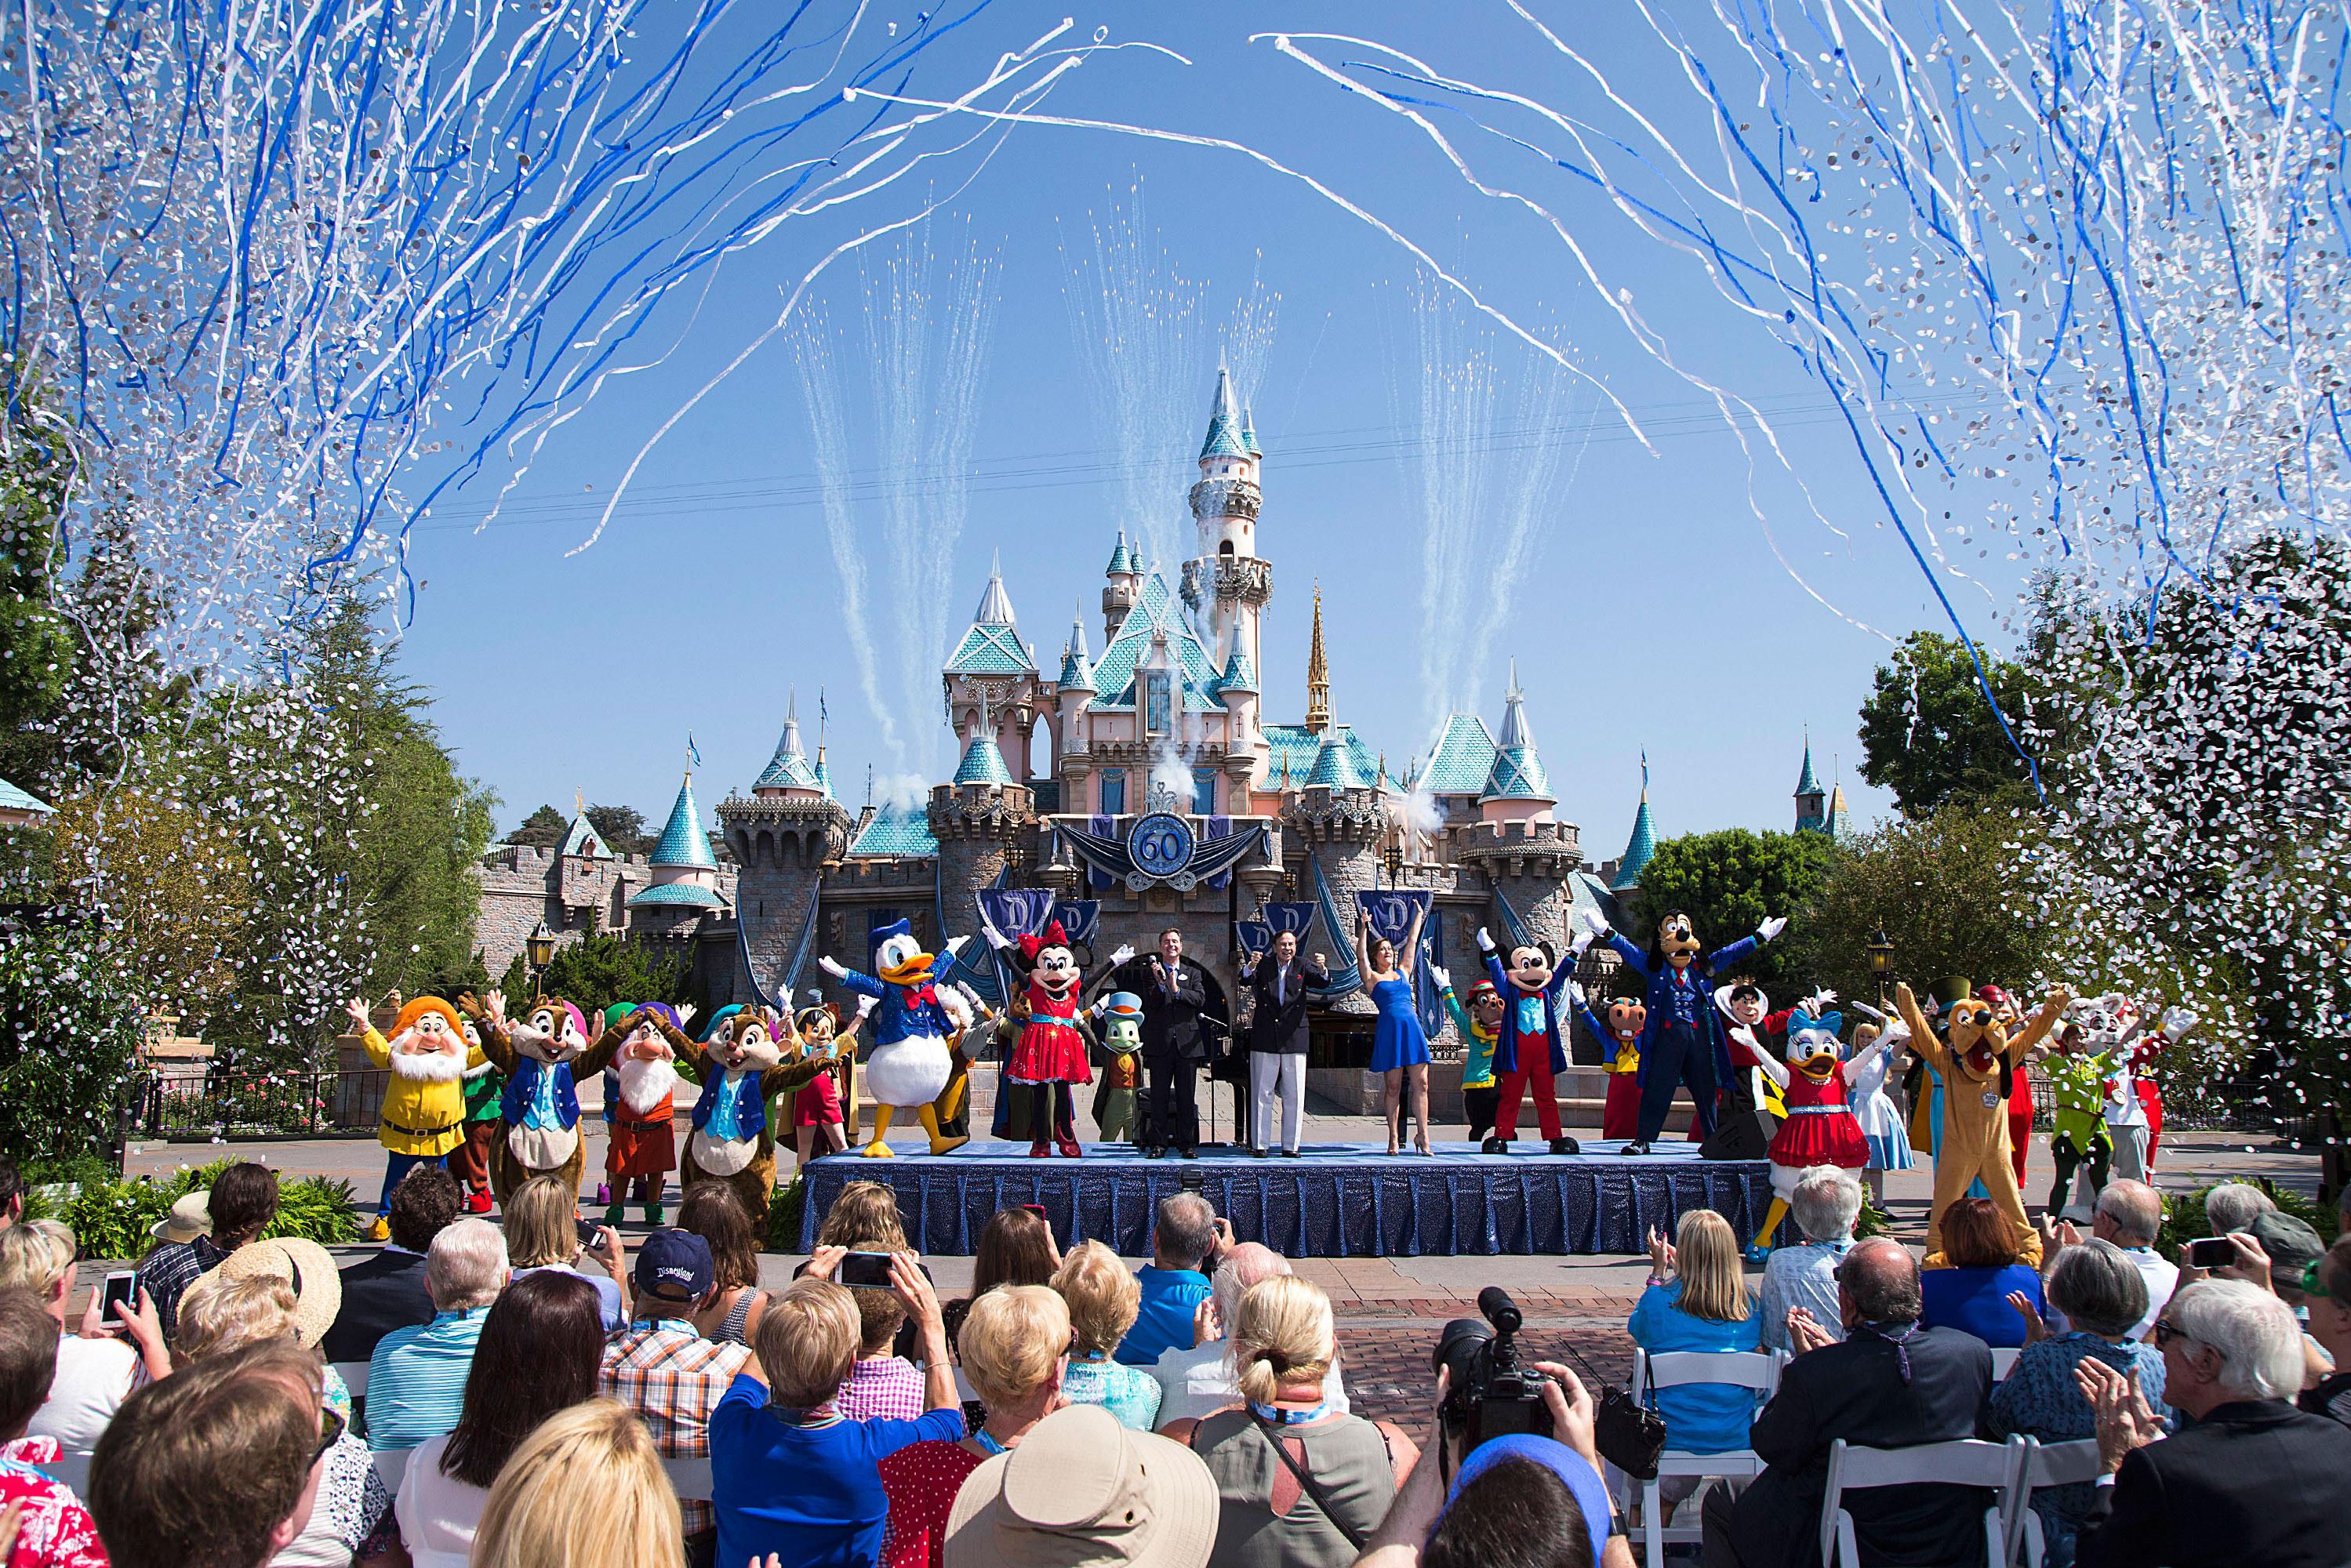 <strong>1. Disneyland, Anaheim, California, America</strong>